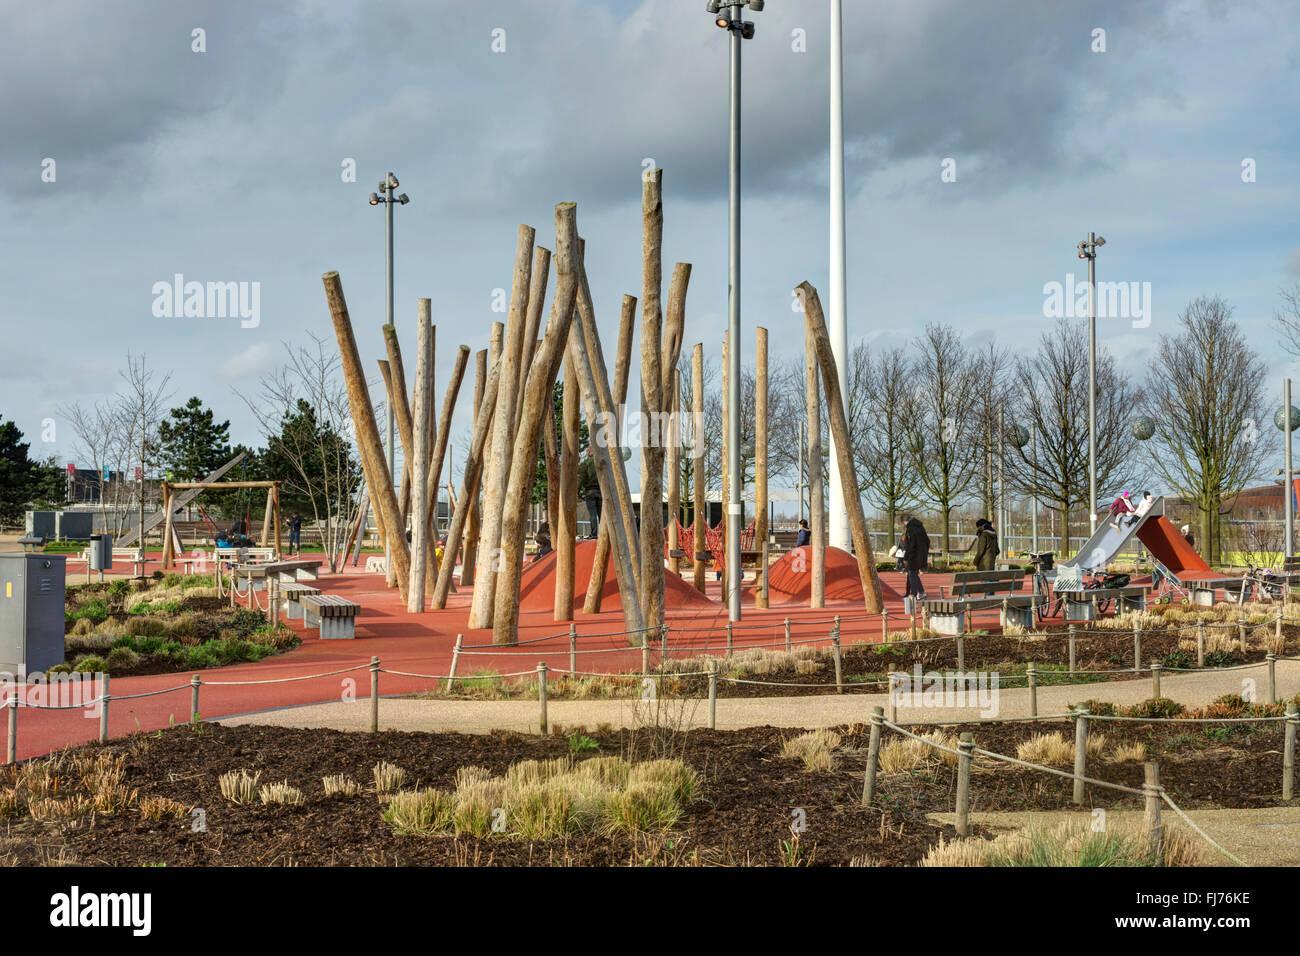 Playground Olympic Park London